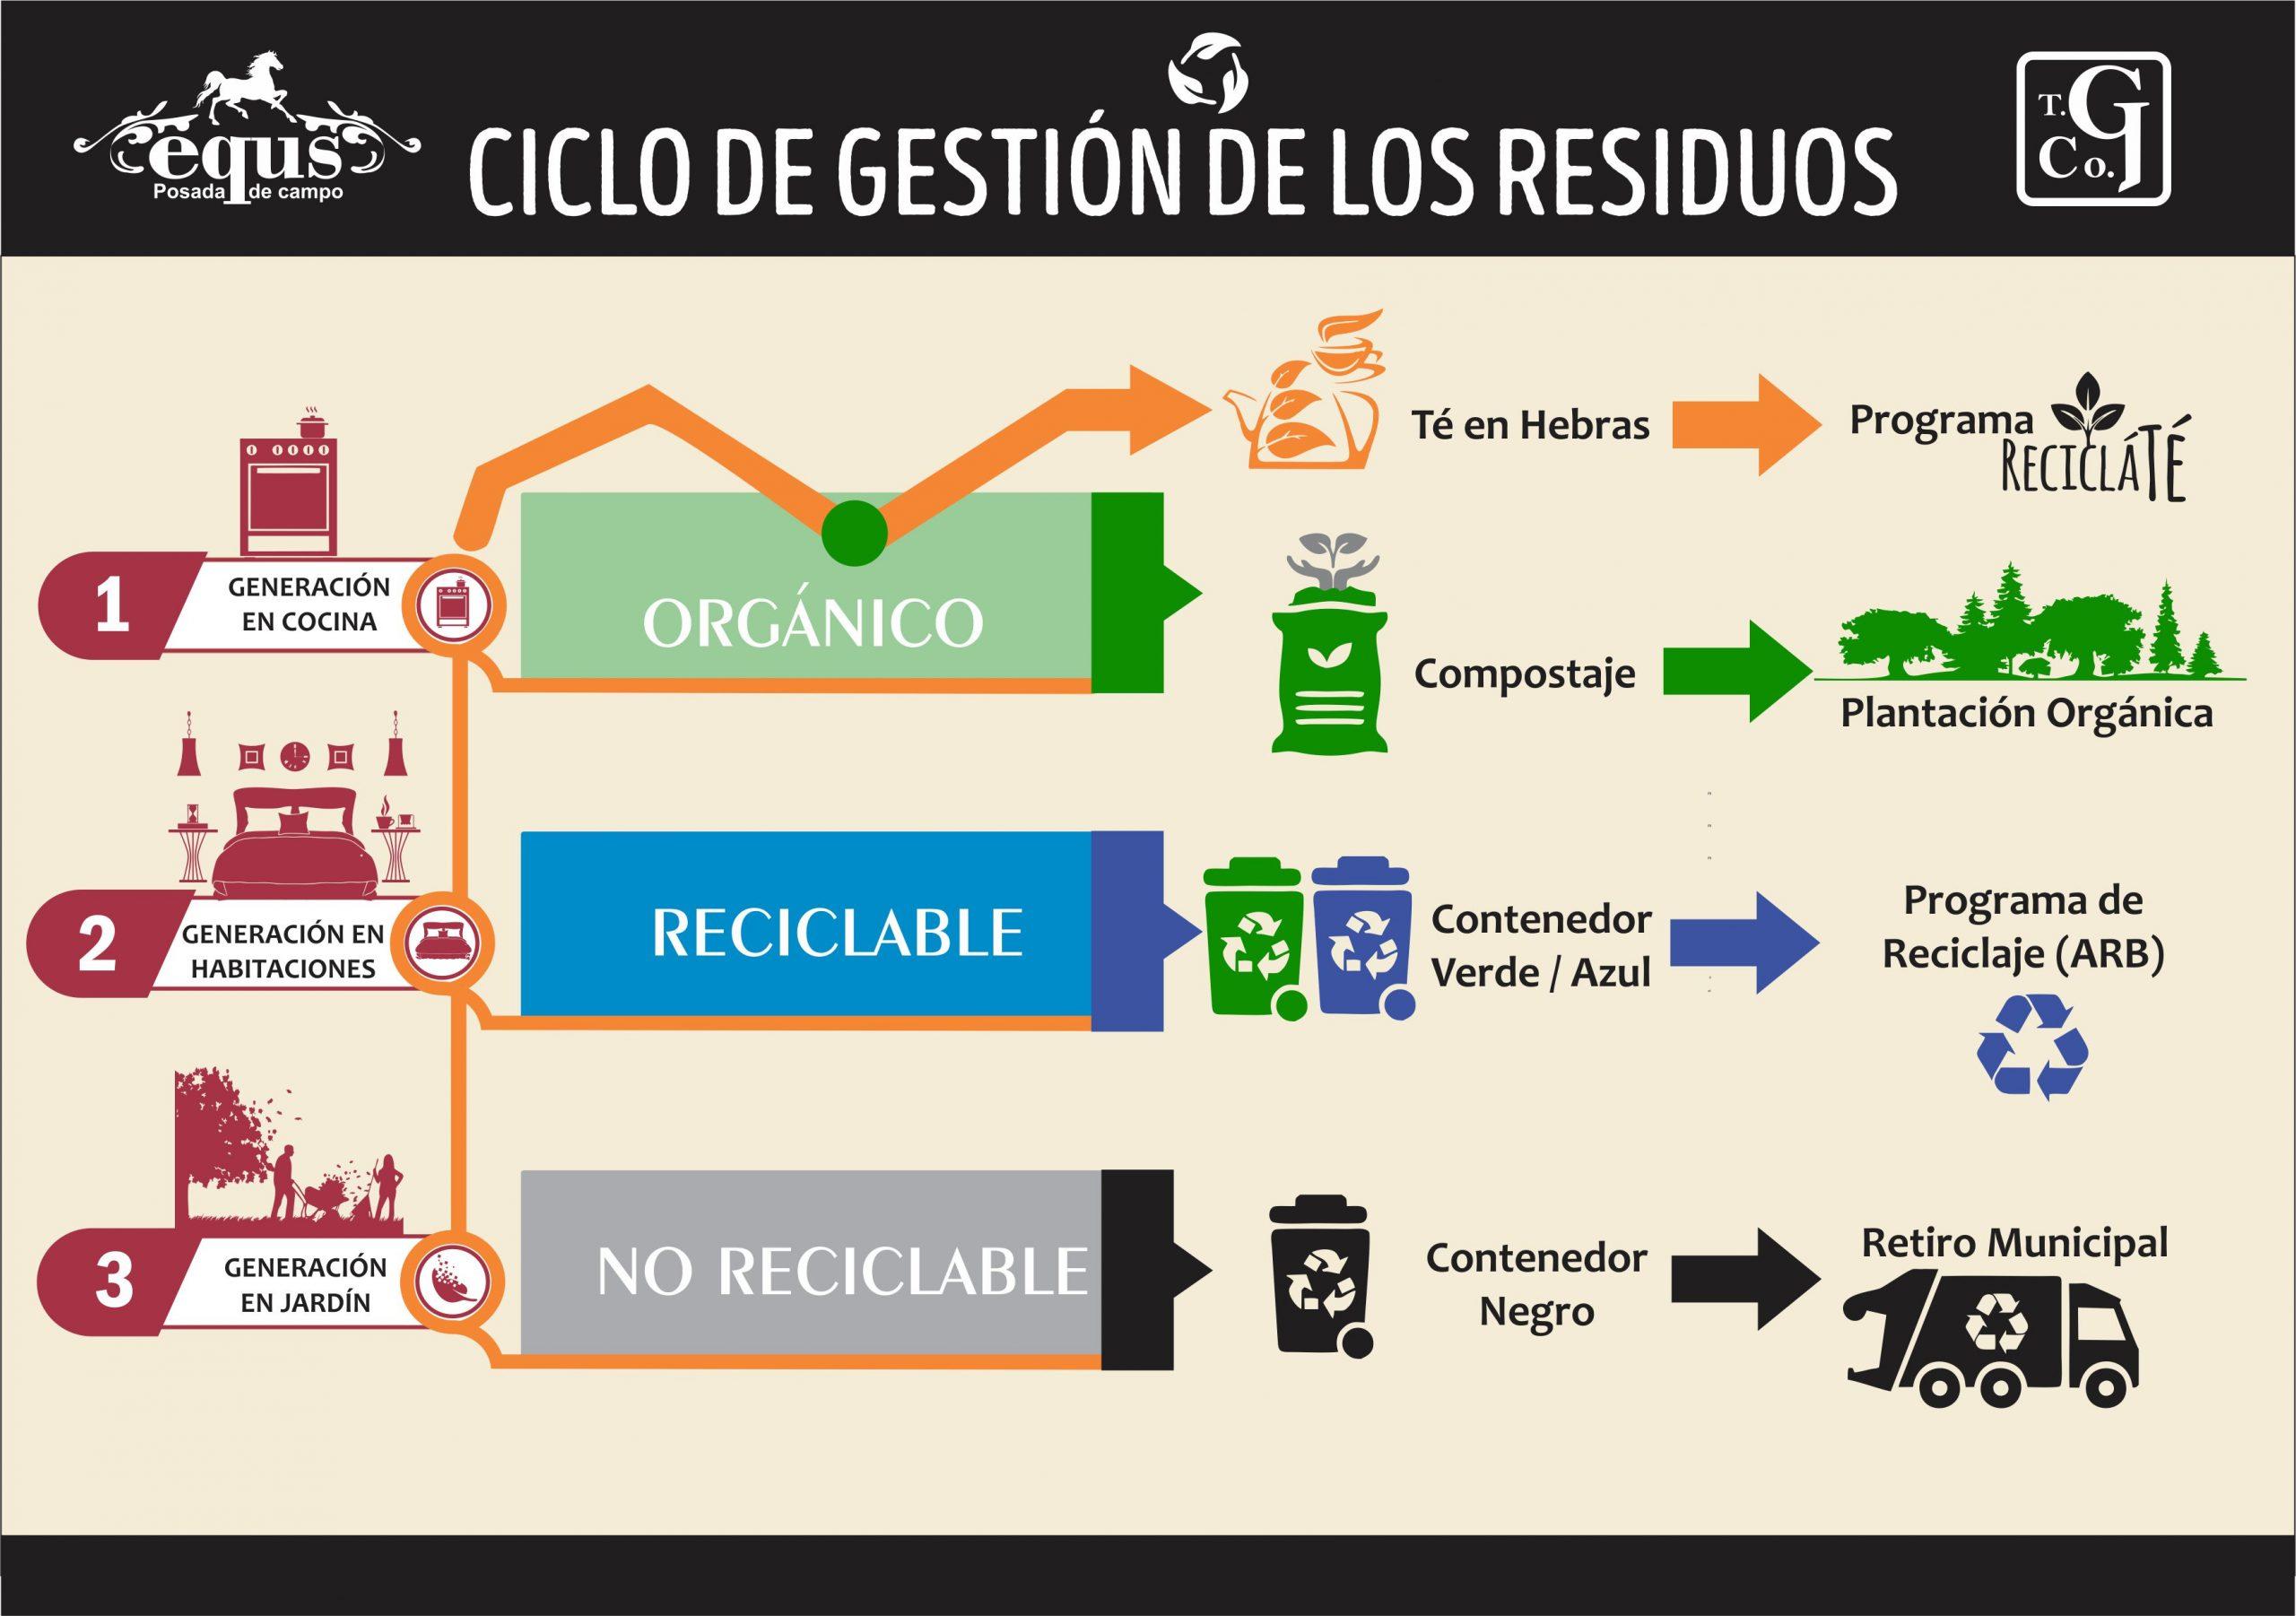 "img src=""gestion de residuos.jpg"" alt="""""